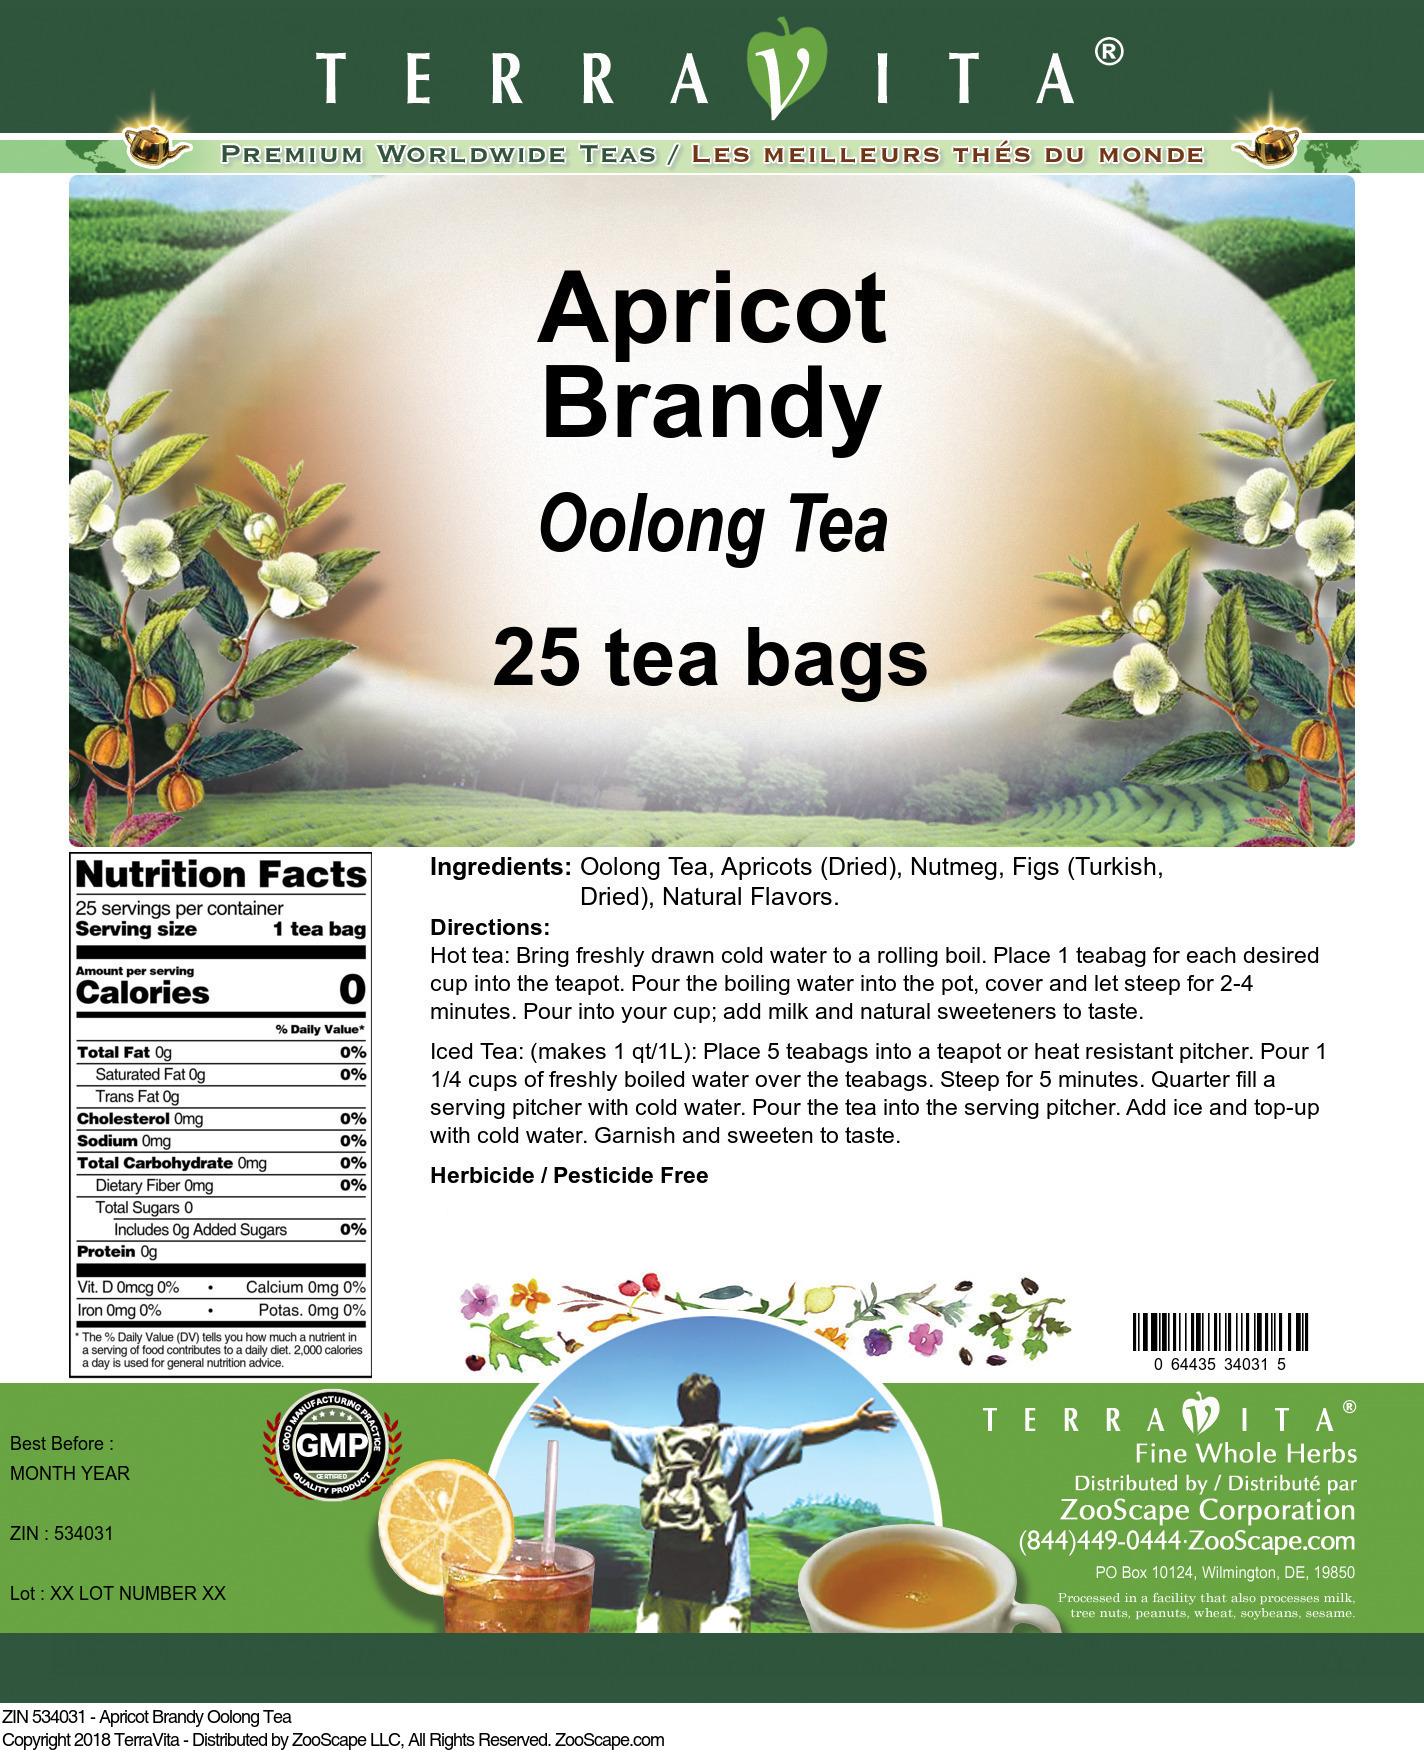 Apricot Brandy Oolong Tea